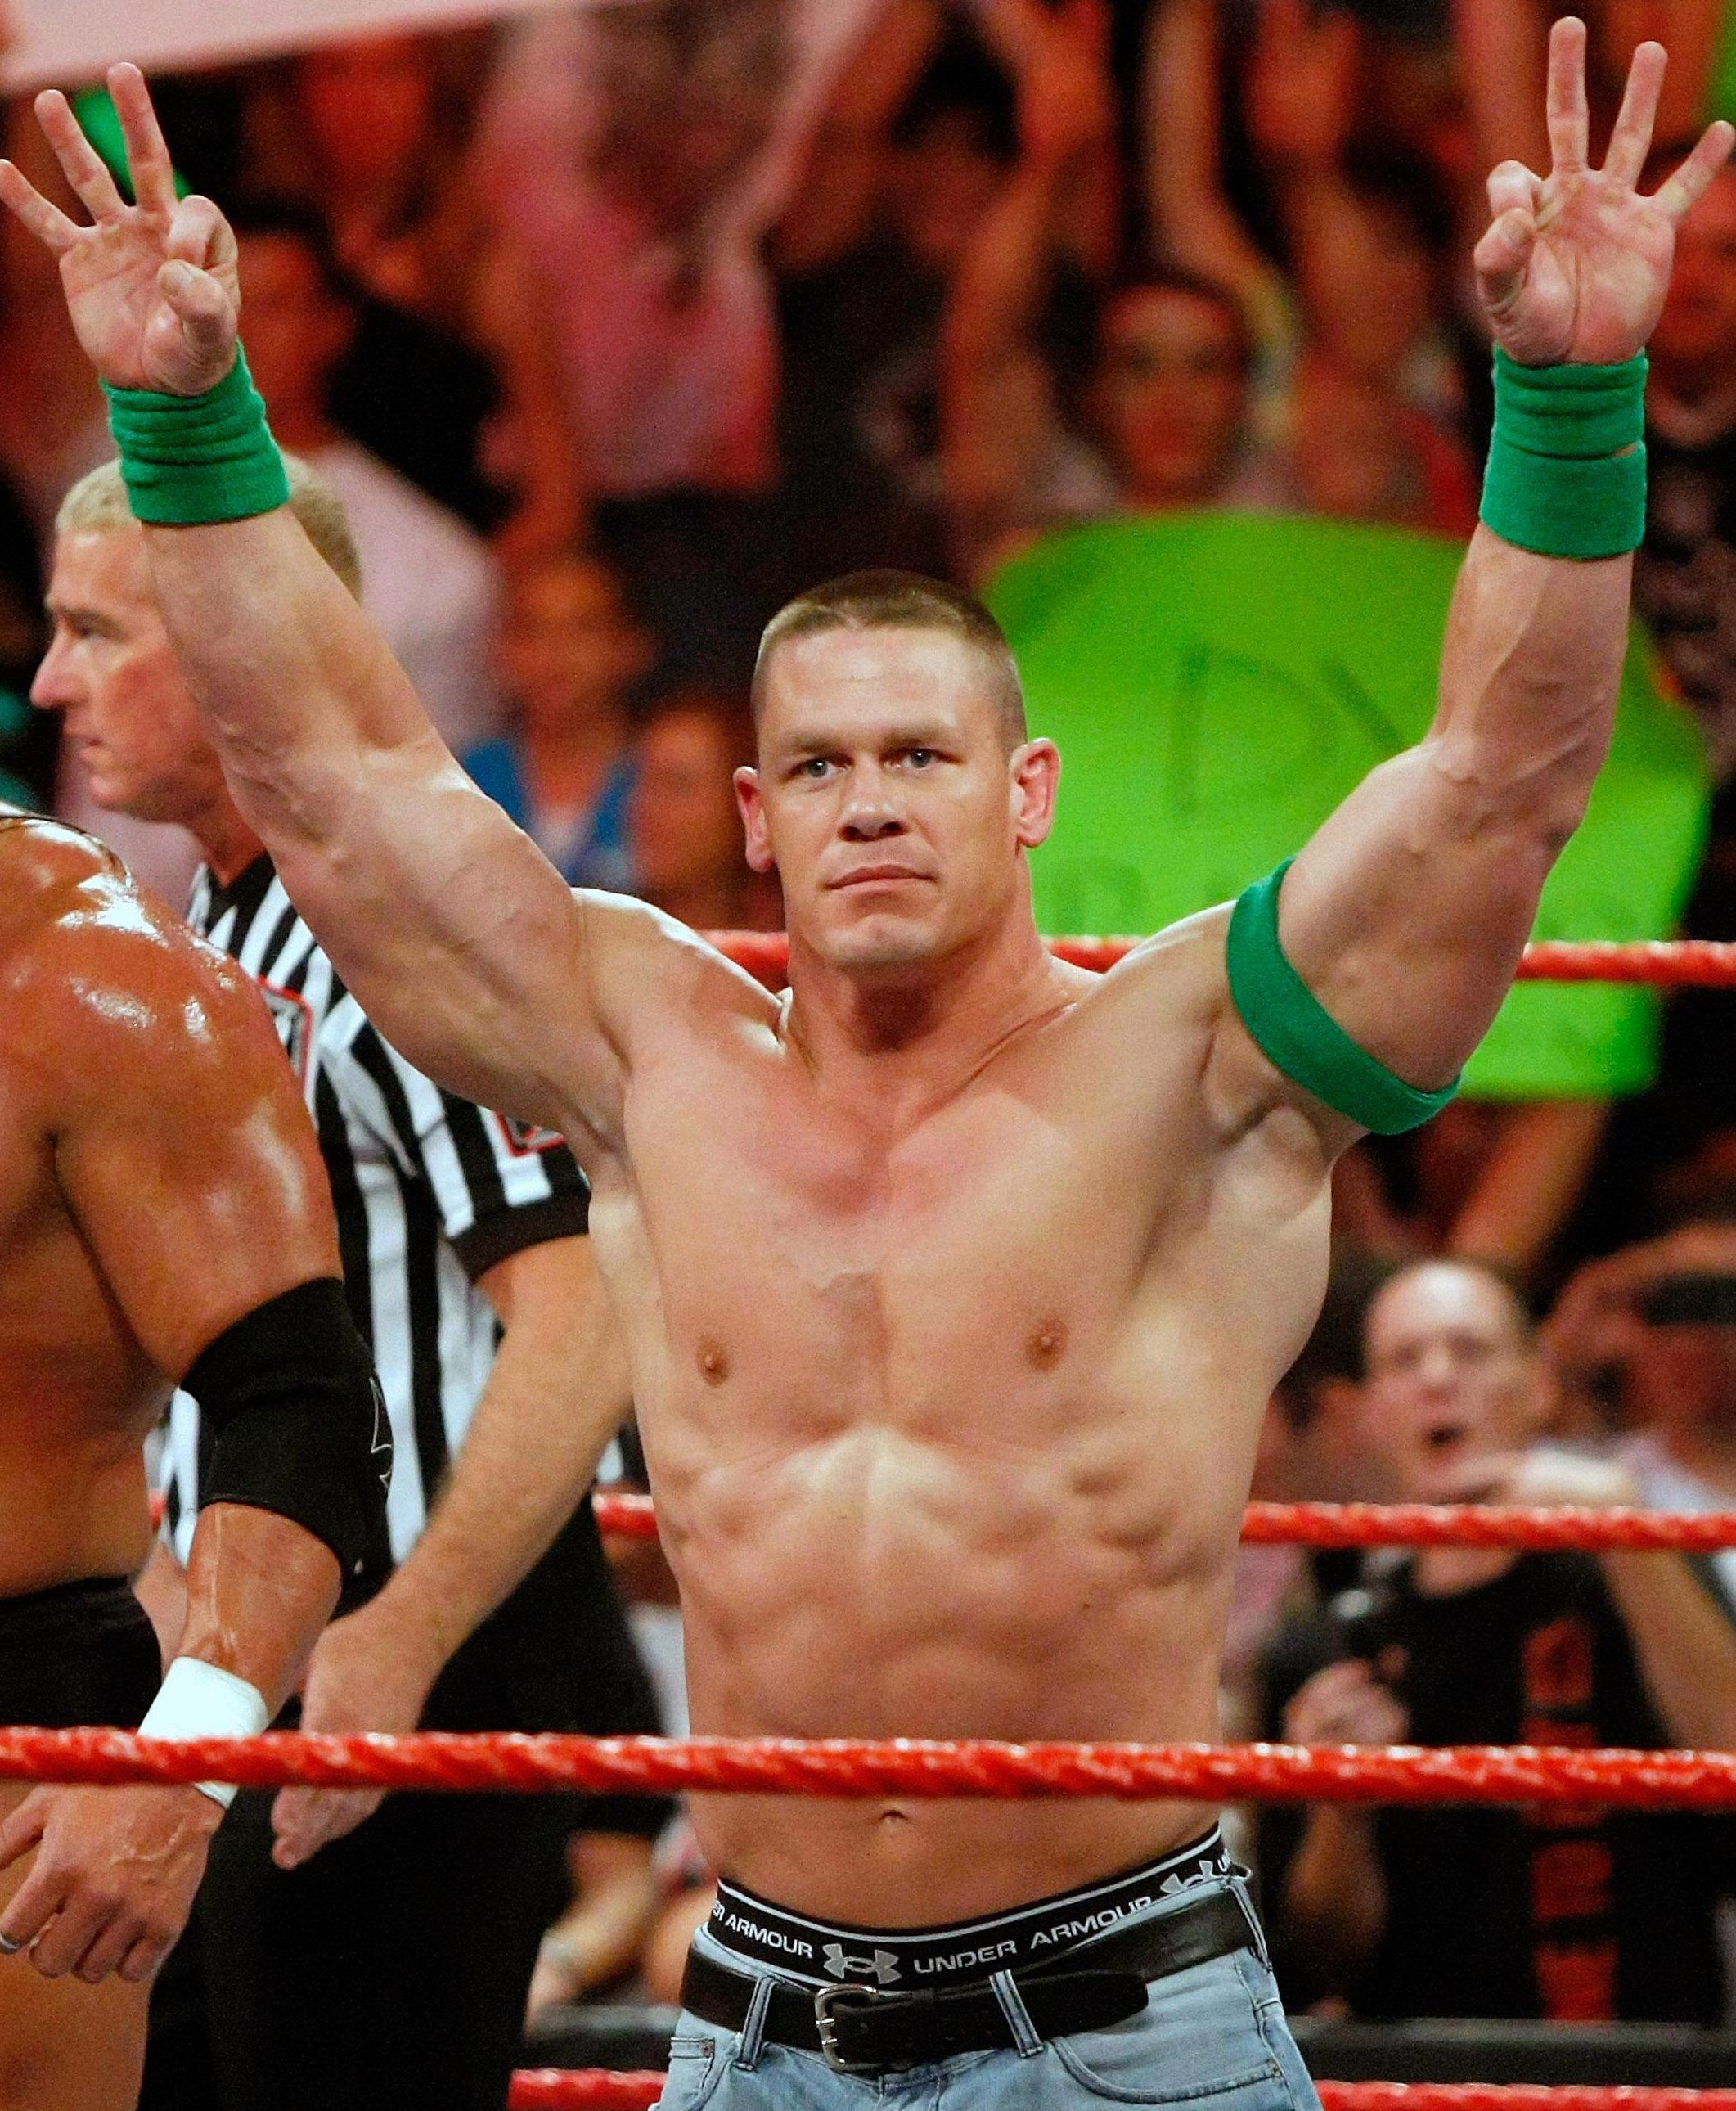 John Cena decided not to grapple at the Crown Jewel in Saudi Arabia